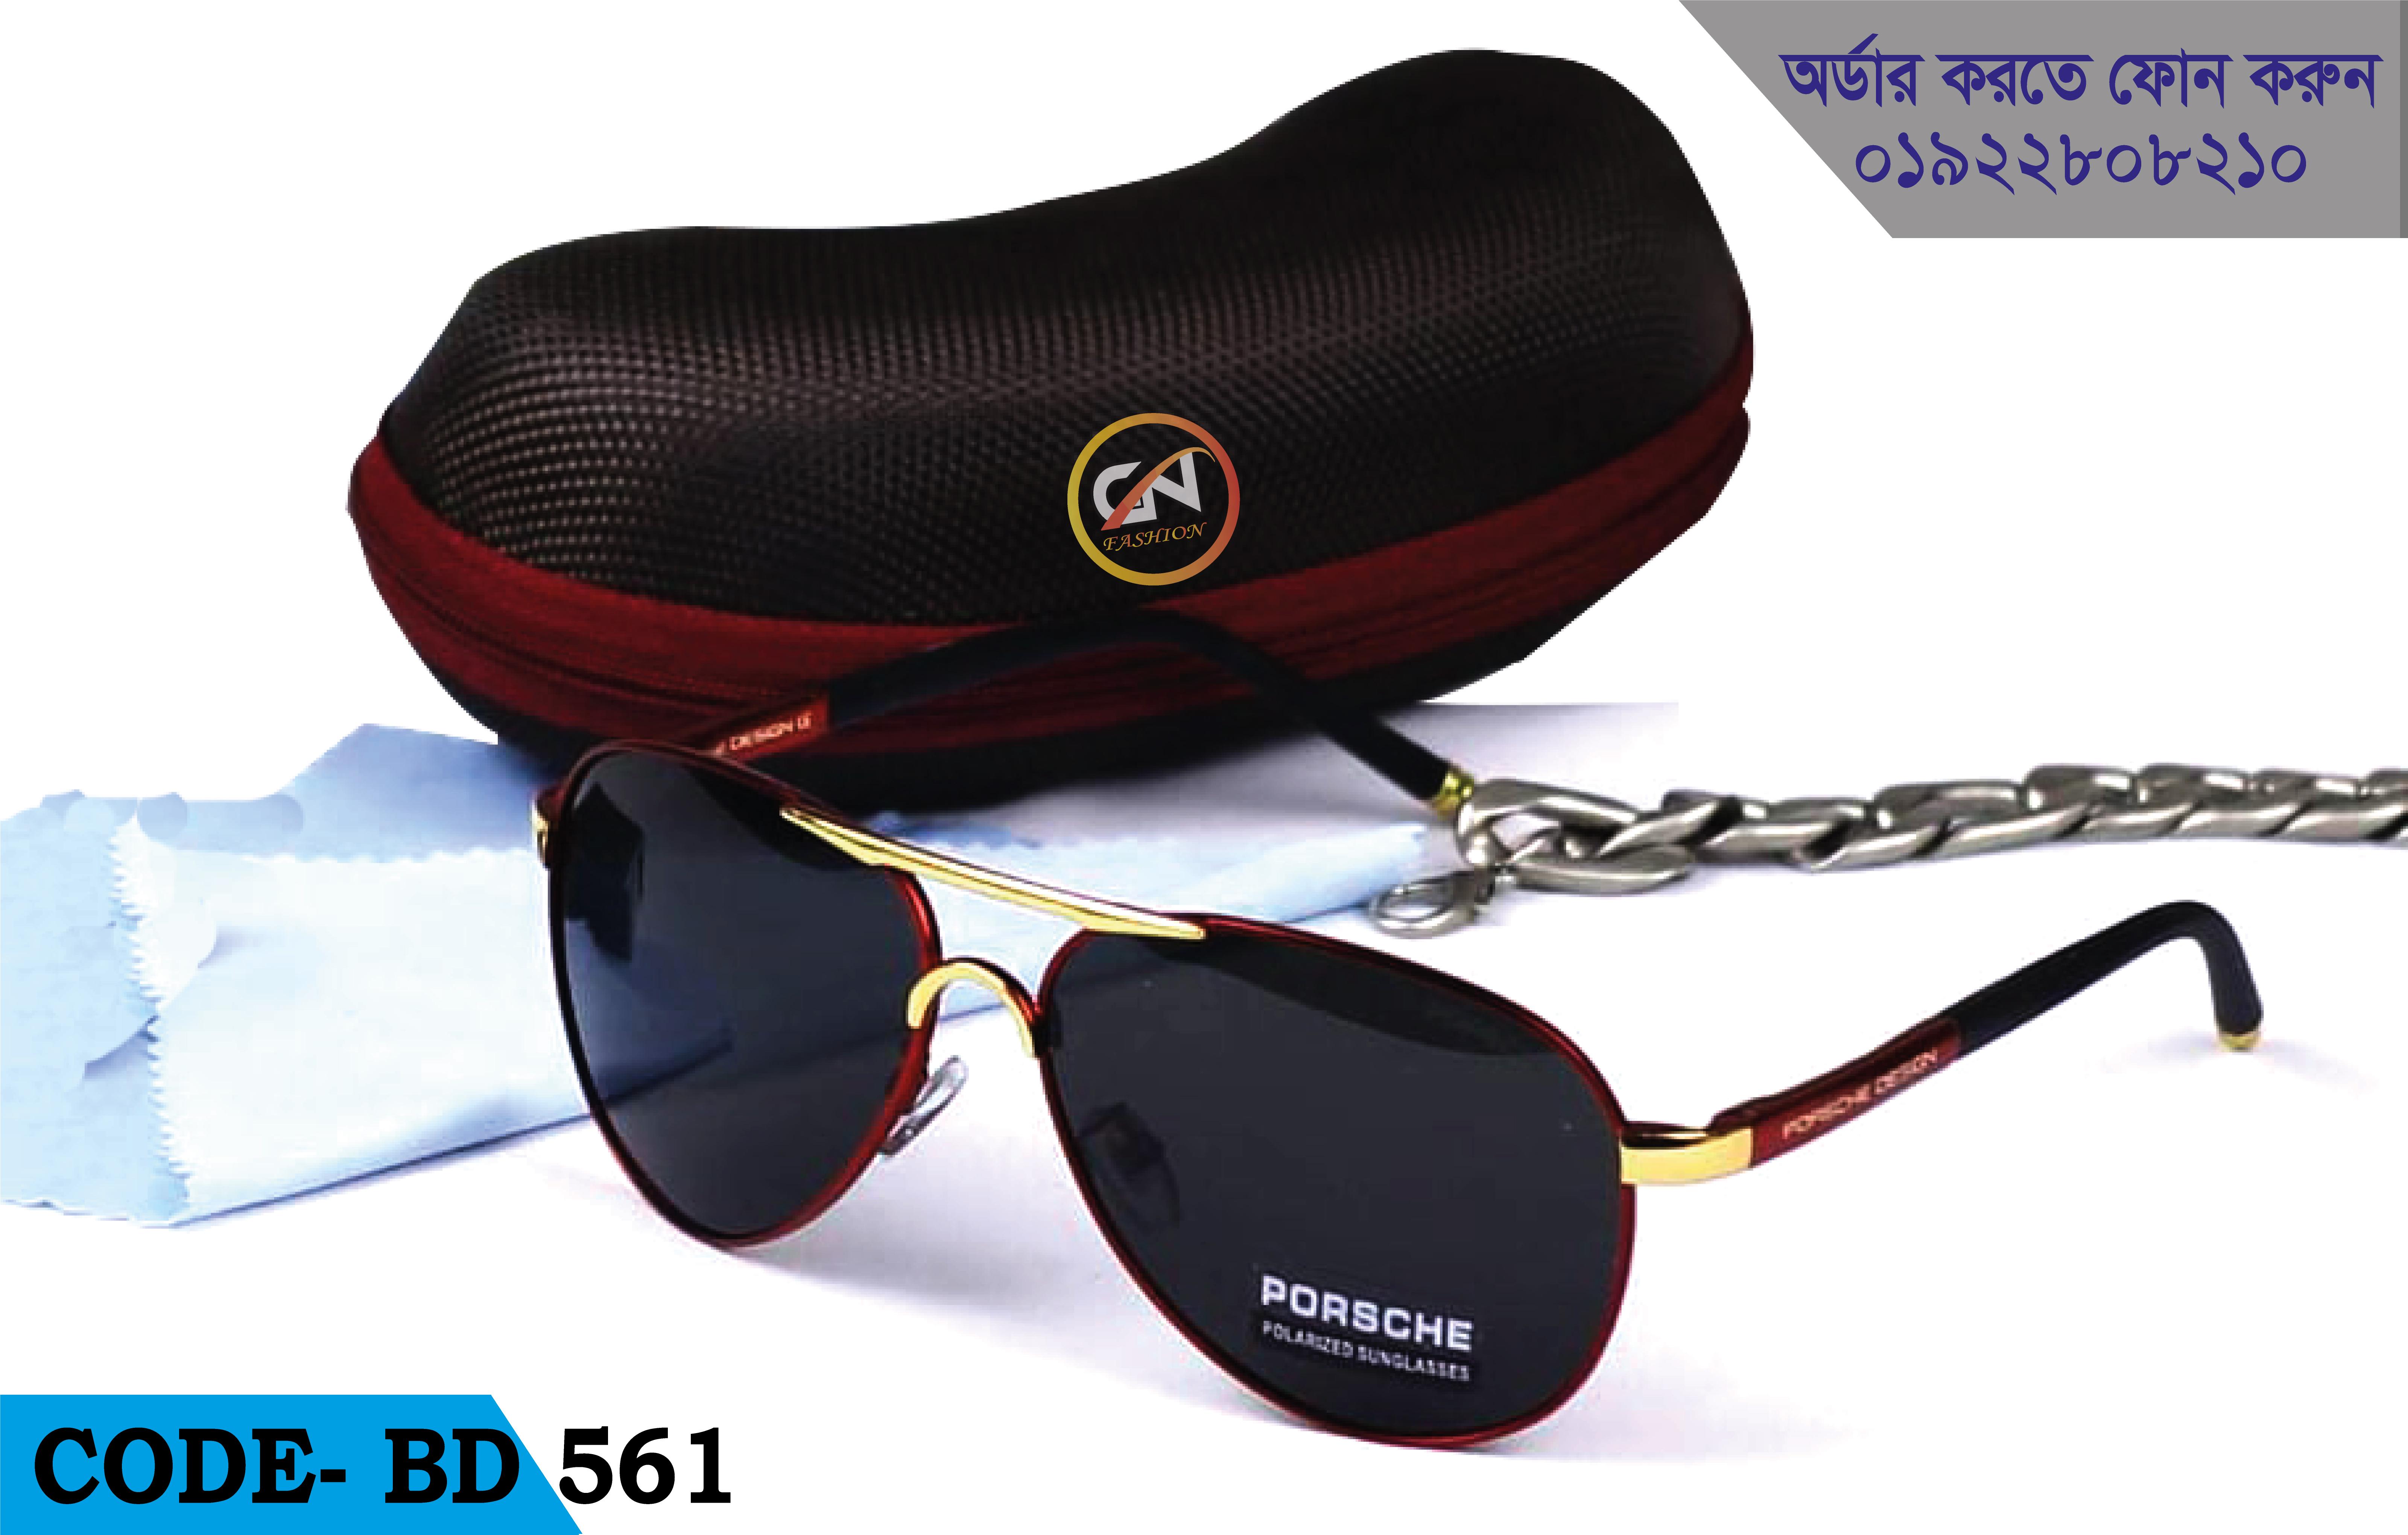 Best sunglass brands for man( Porsche branded polarized sunglass in...